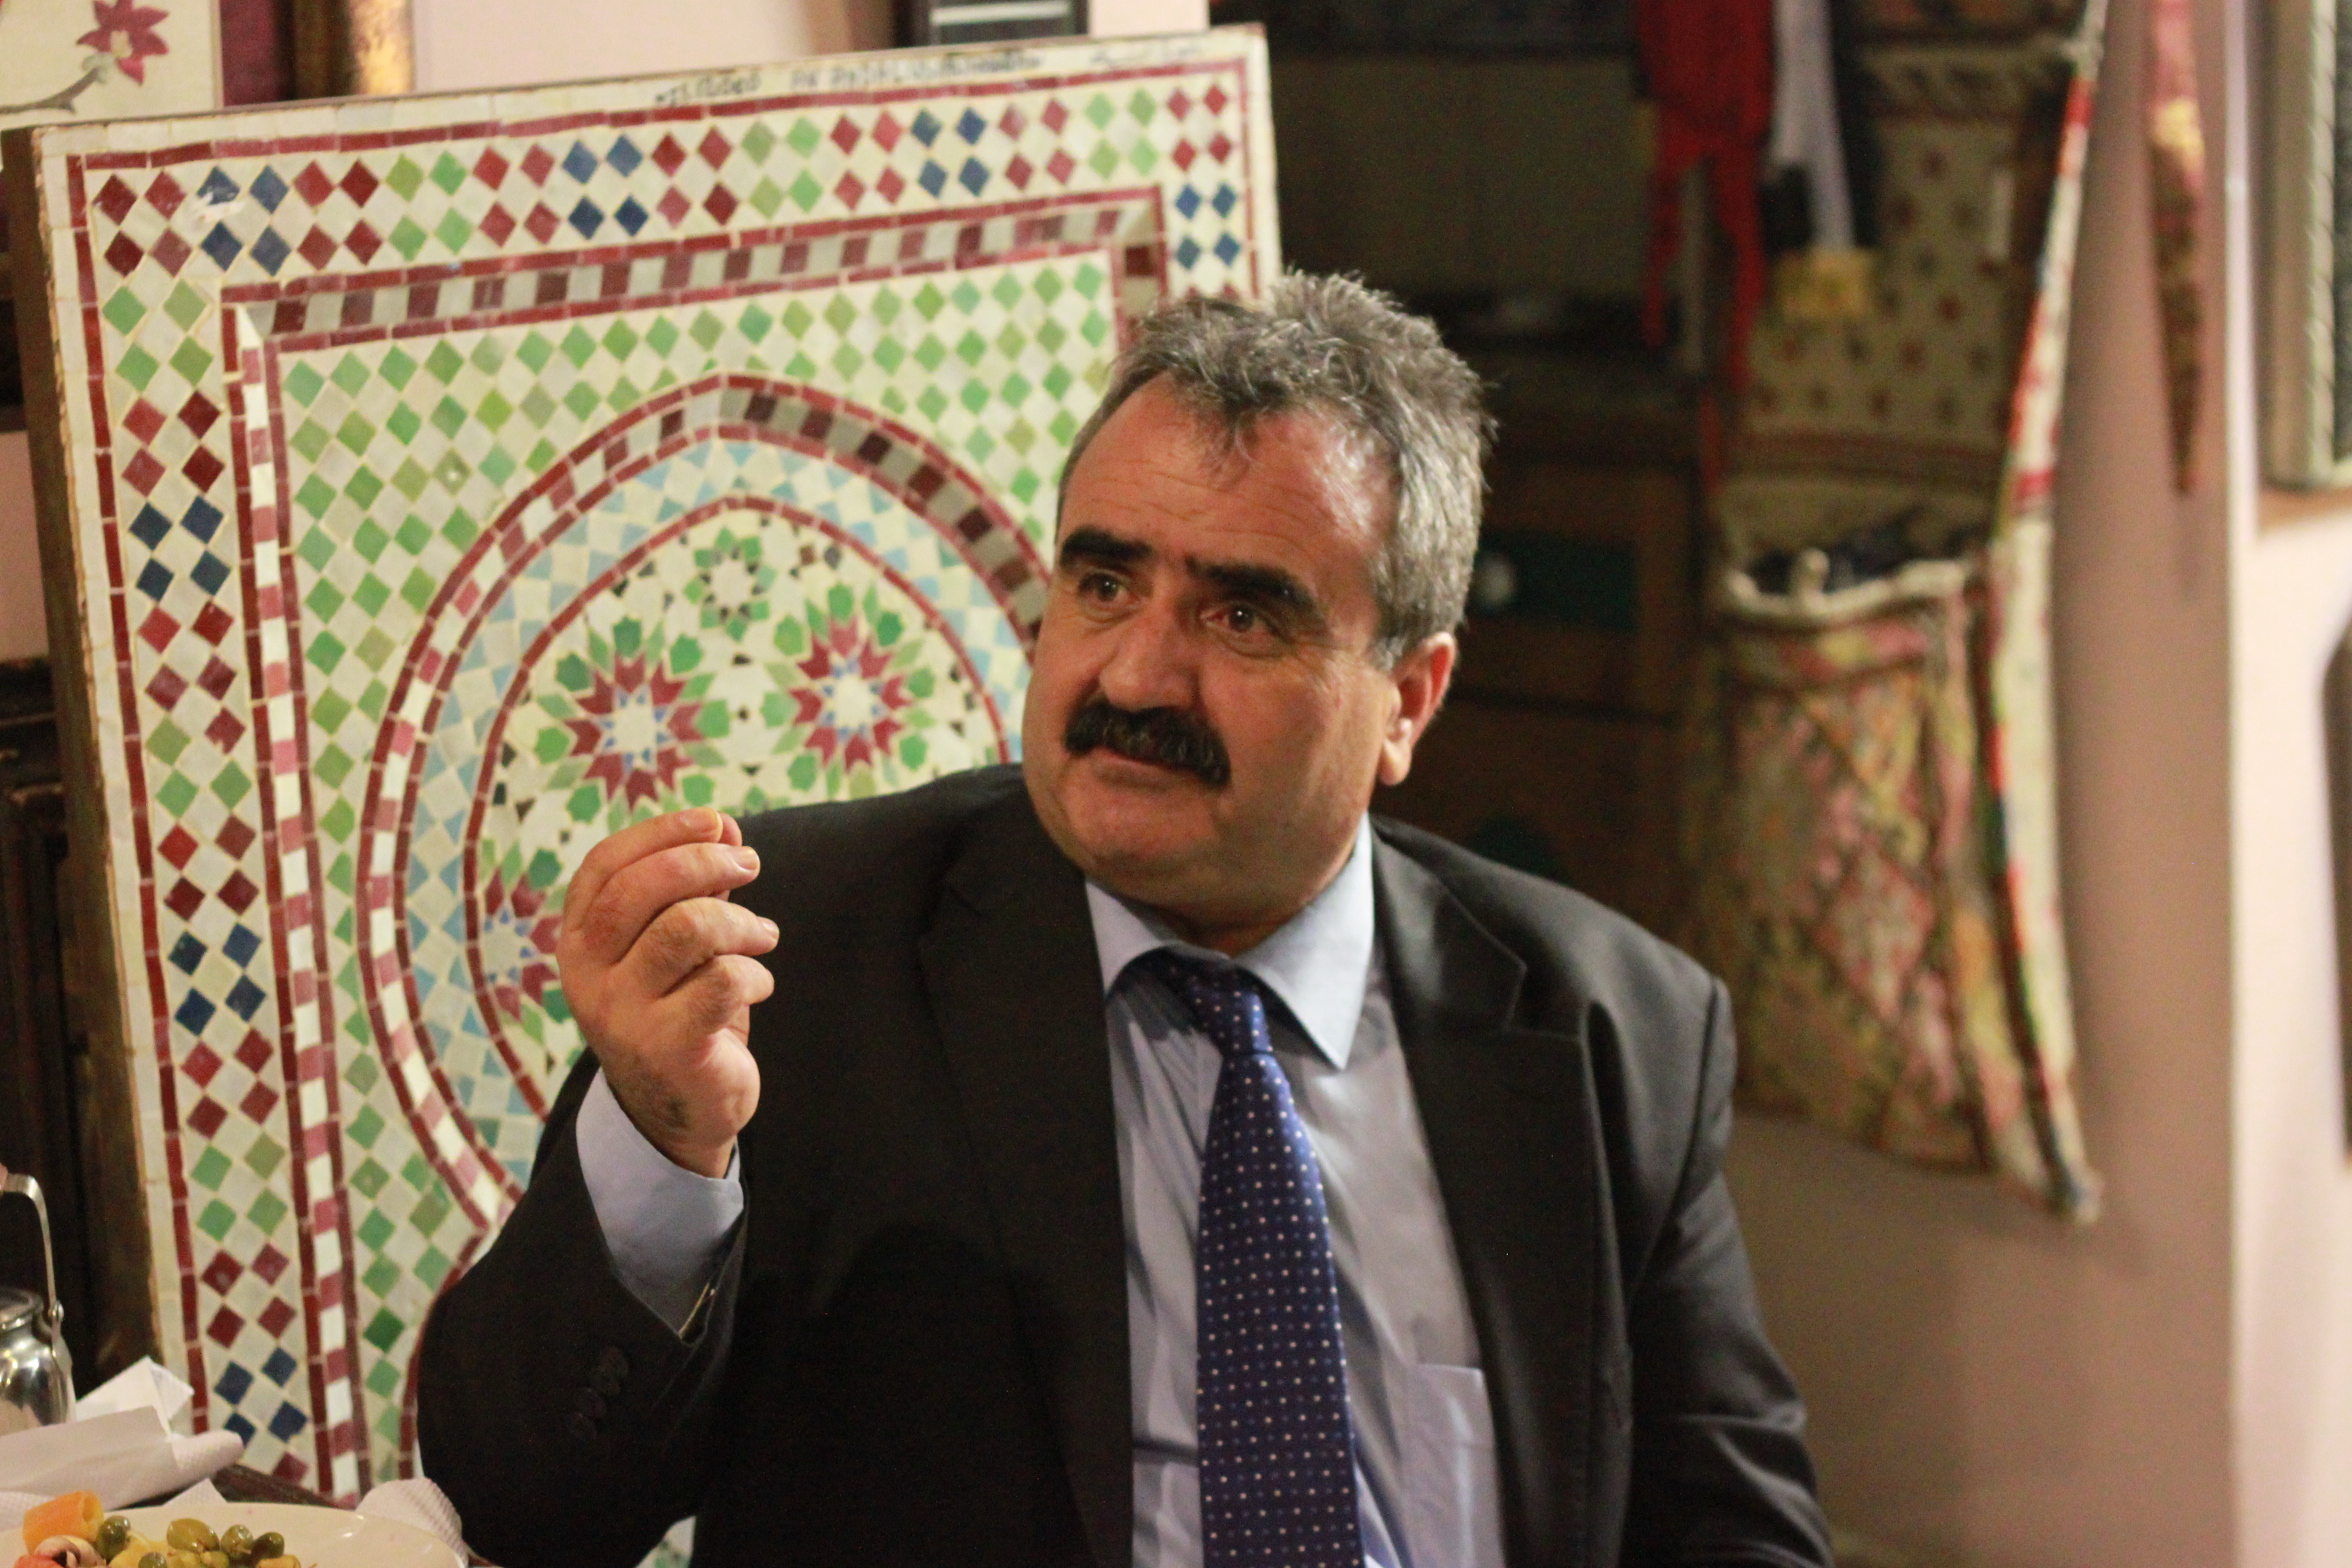 Asad Ewaiwi, a Palestinian political activist and university professor of political science.